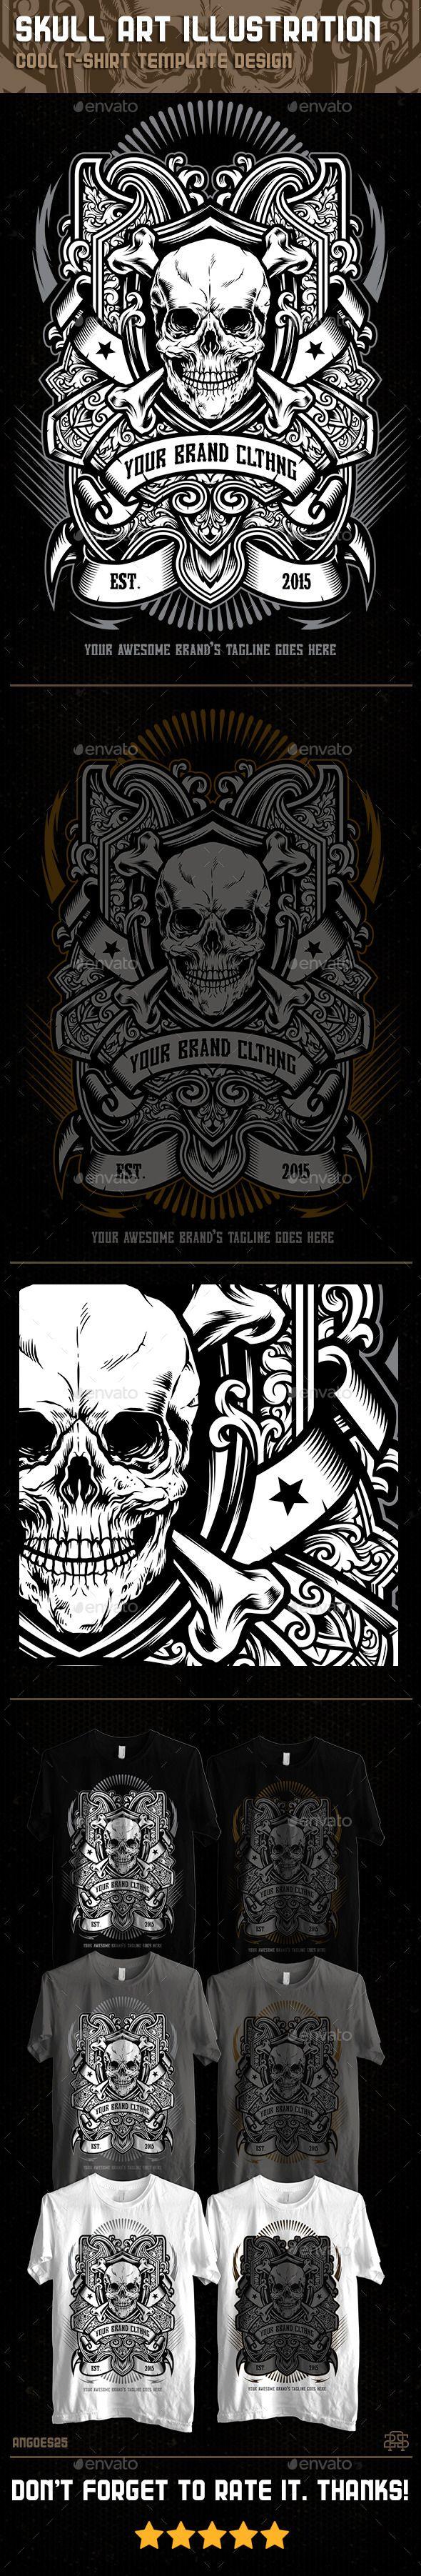 Skull Art Illustration Tshirt Template Design. Download: http://graphicriver.net/item/skull-art-illustration-tshirt-template-design/11939395?ref=ksioks